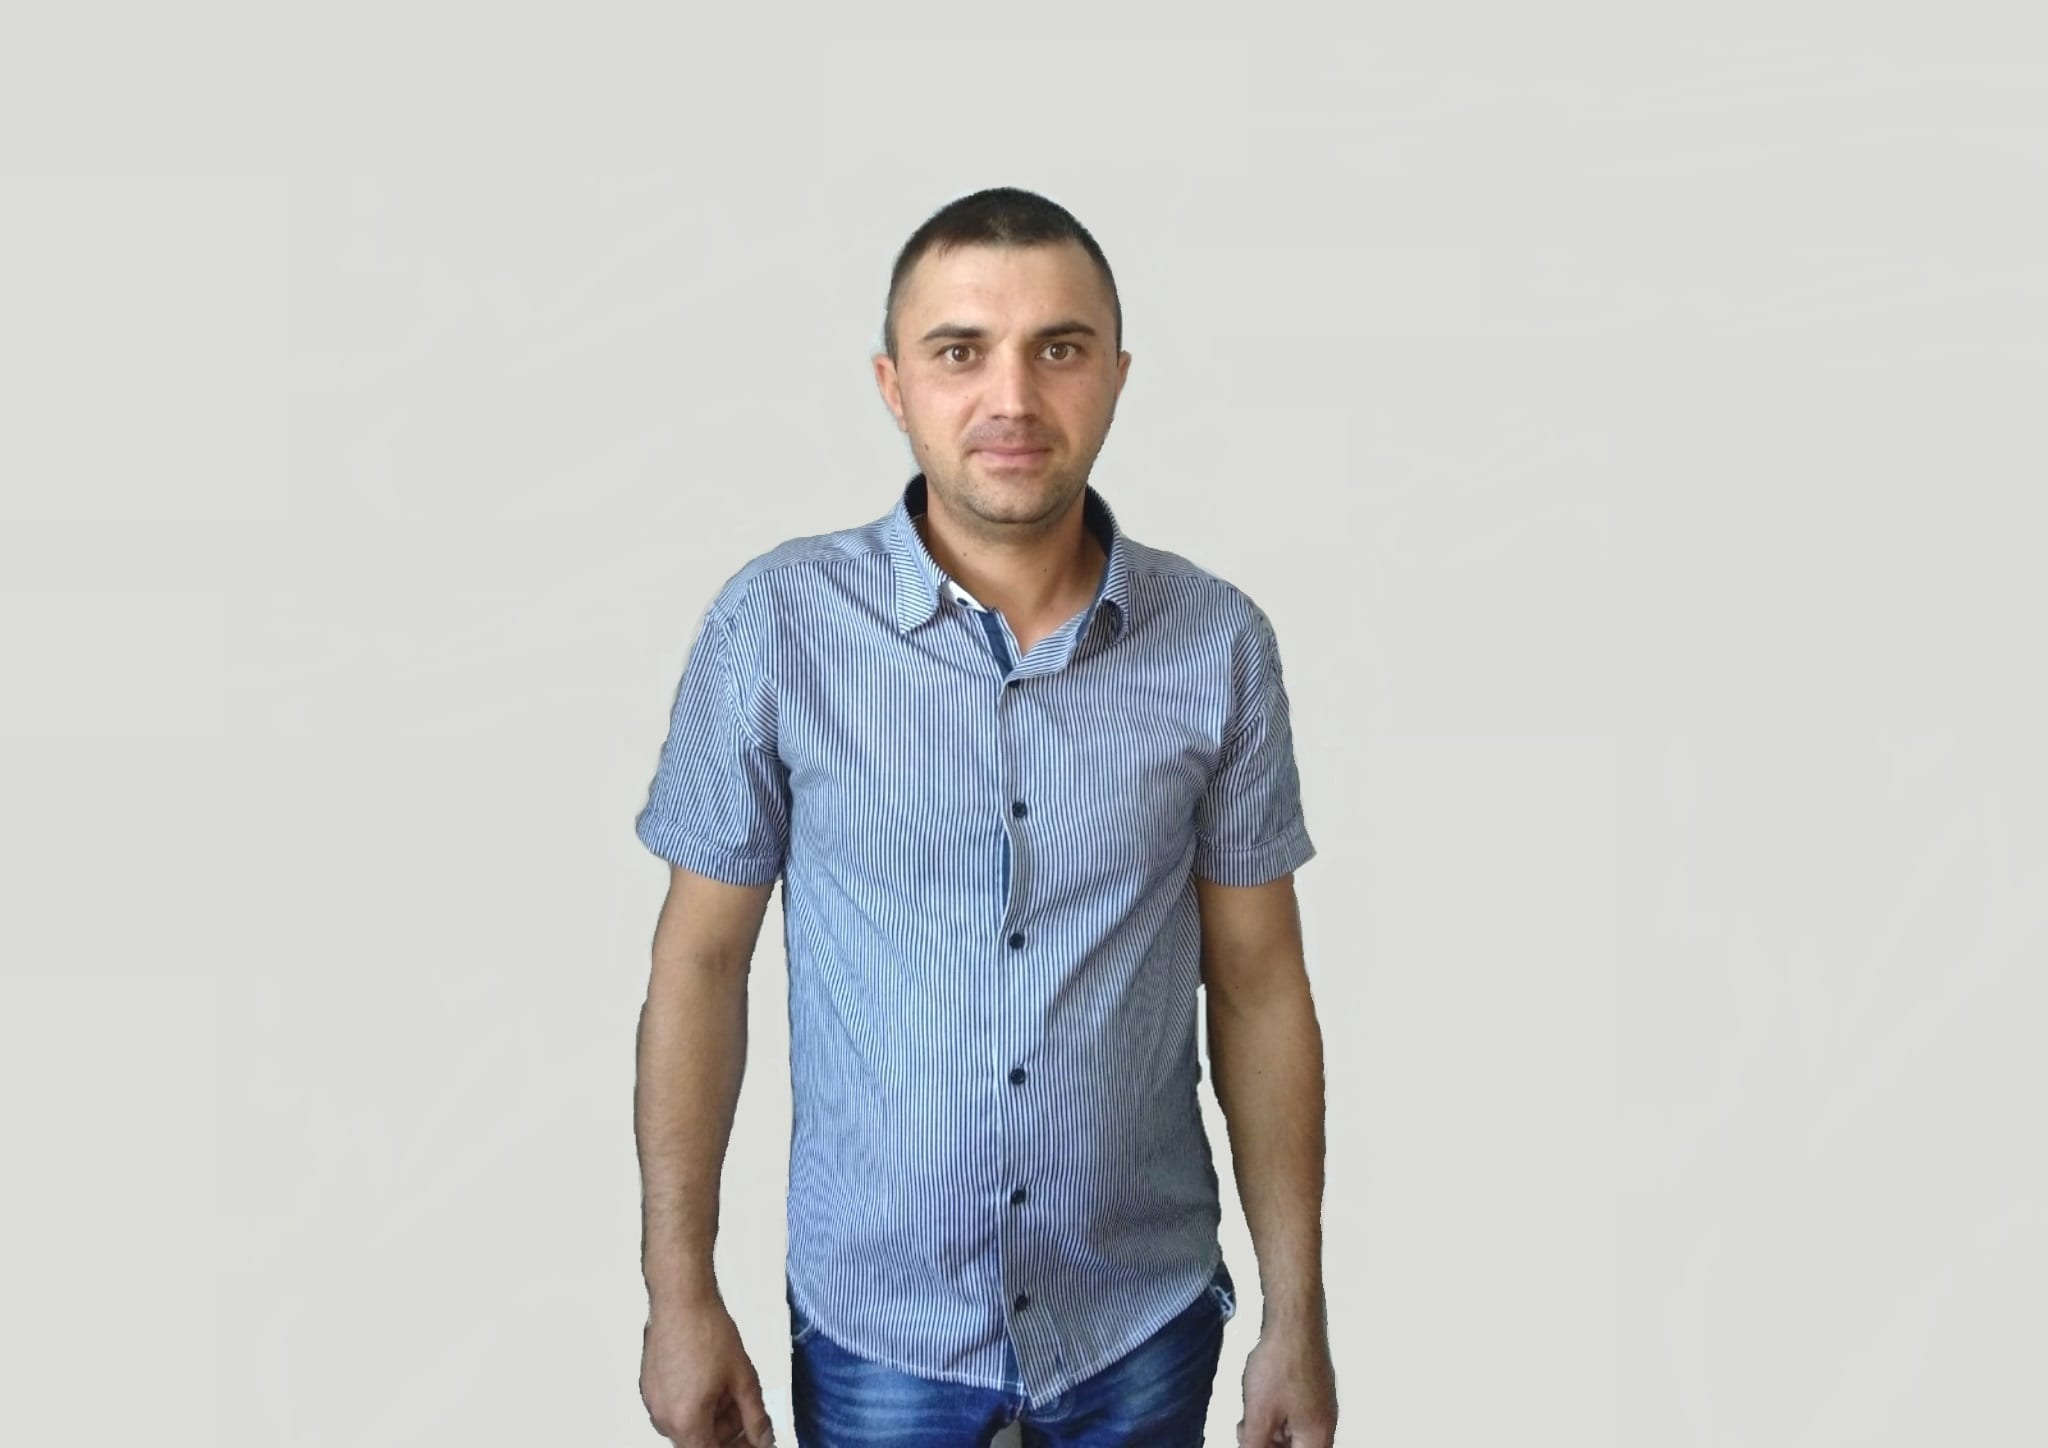 Alexandru Curarari